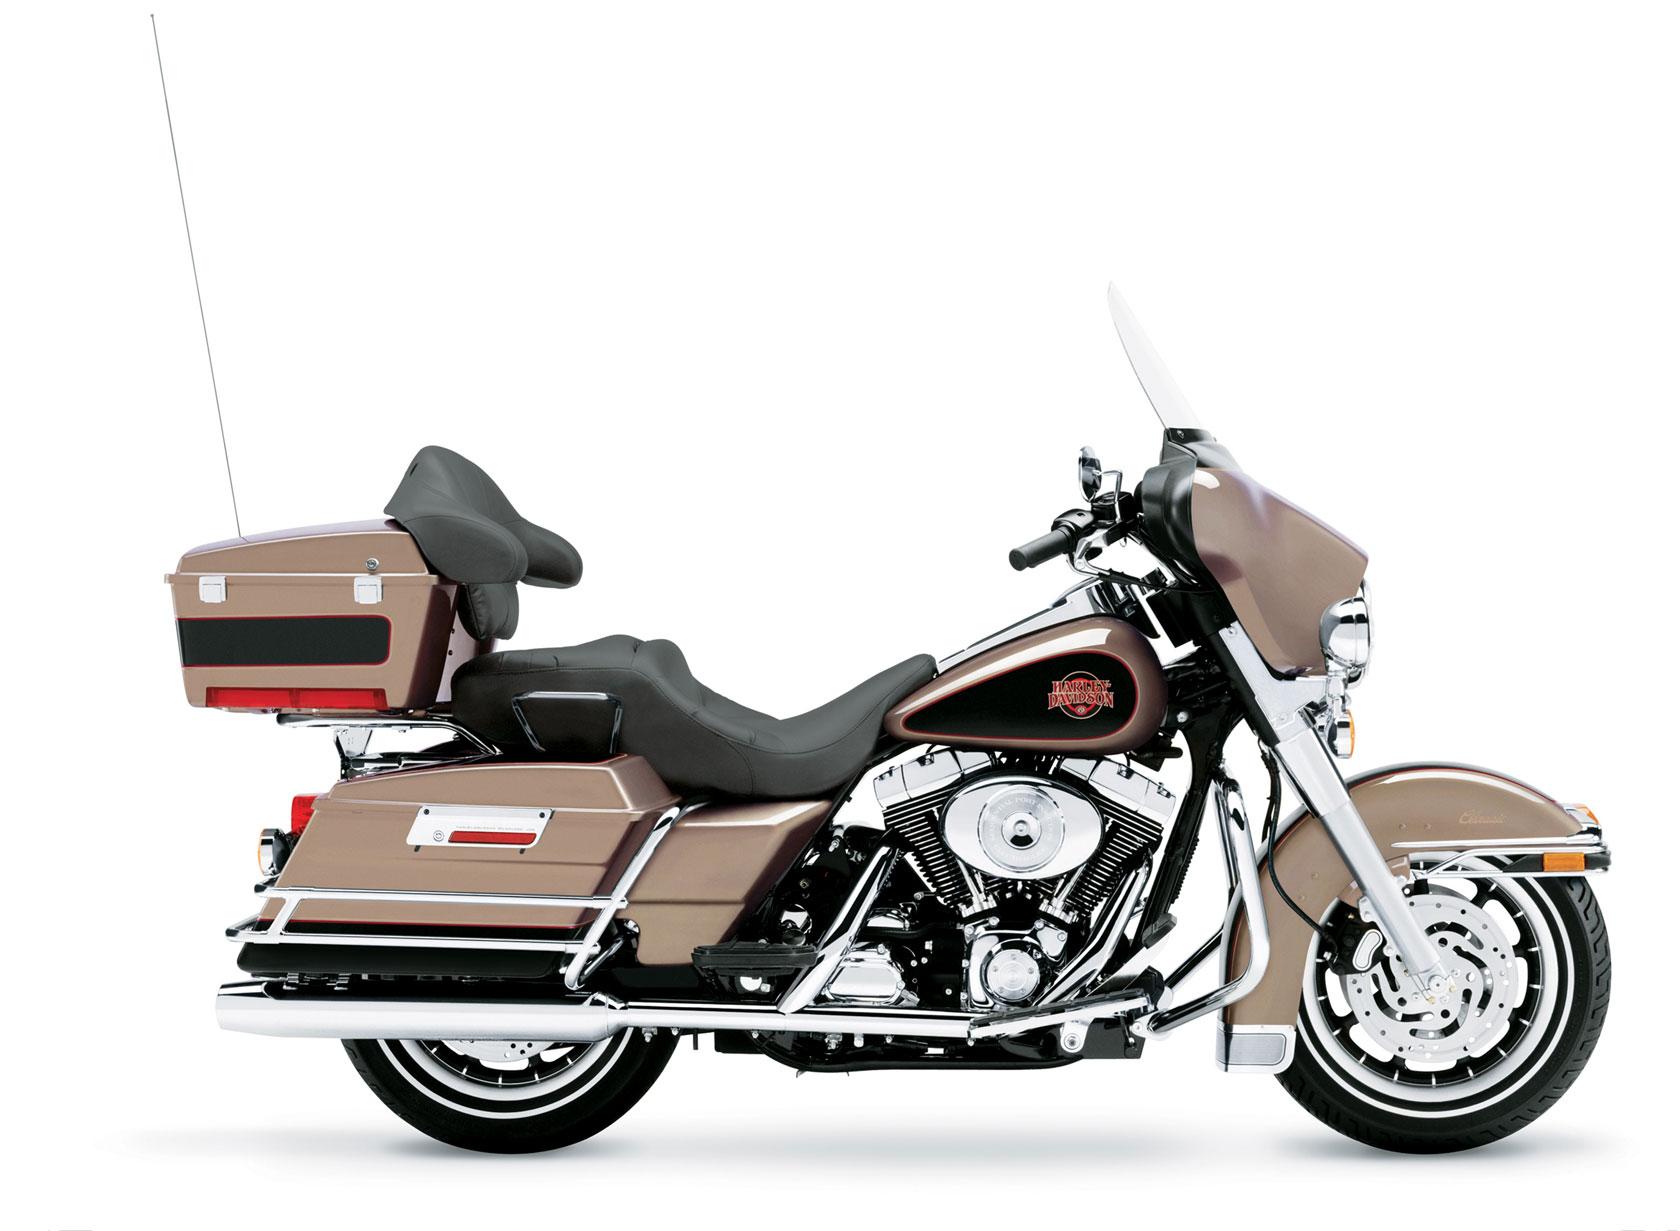 Harley Davidson Electra Glide Exhaust Heat Shield